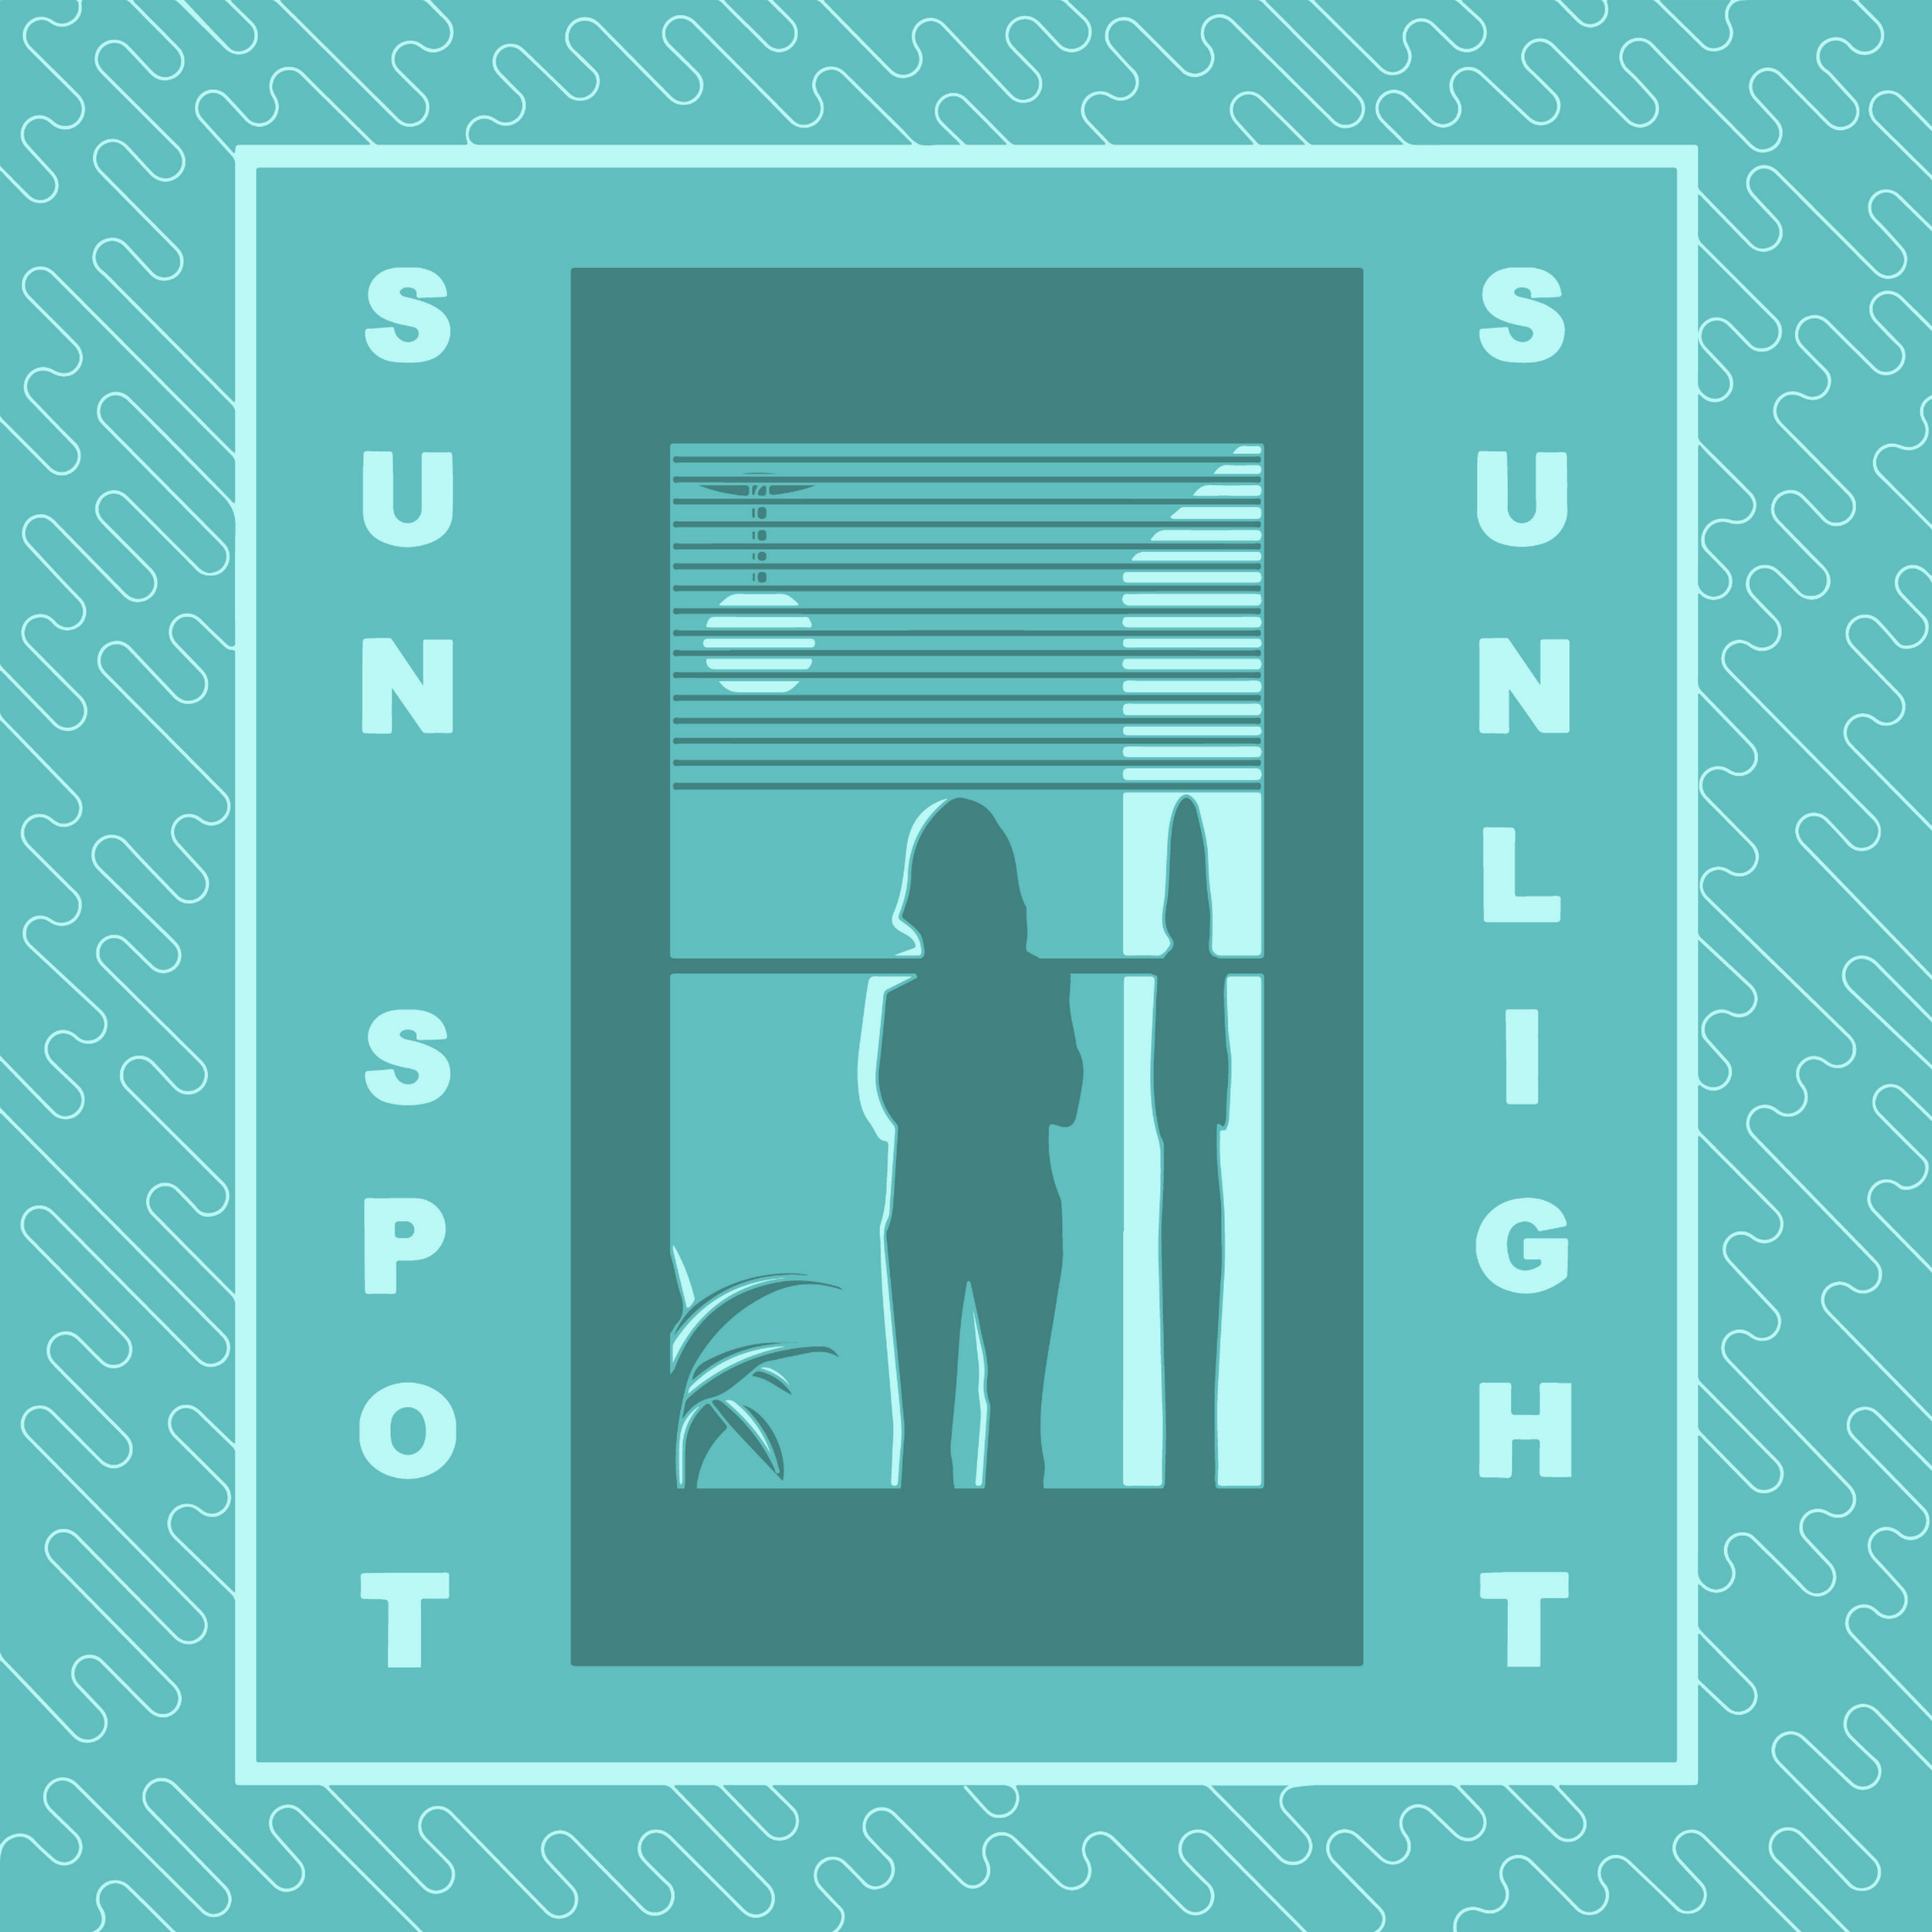 Sun Spot - Sunlight